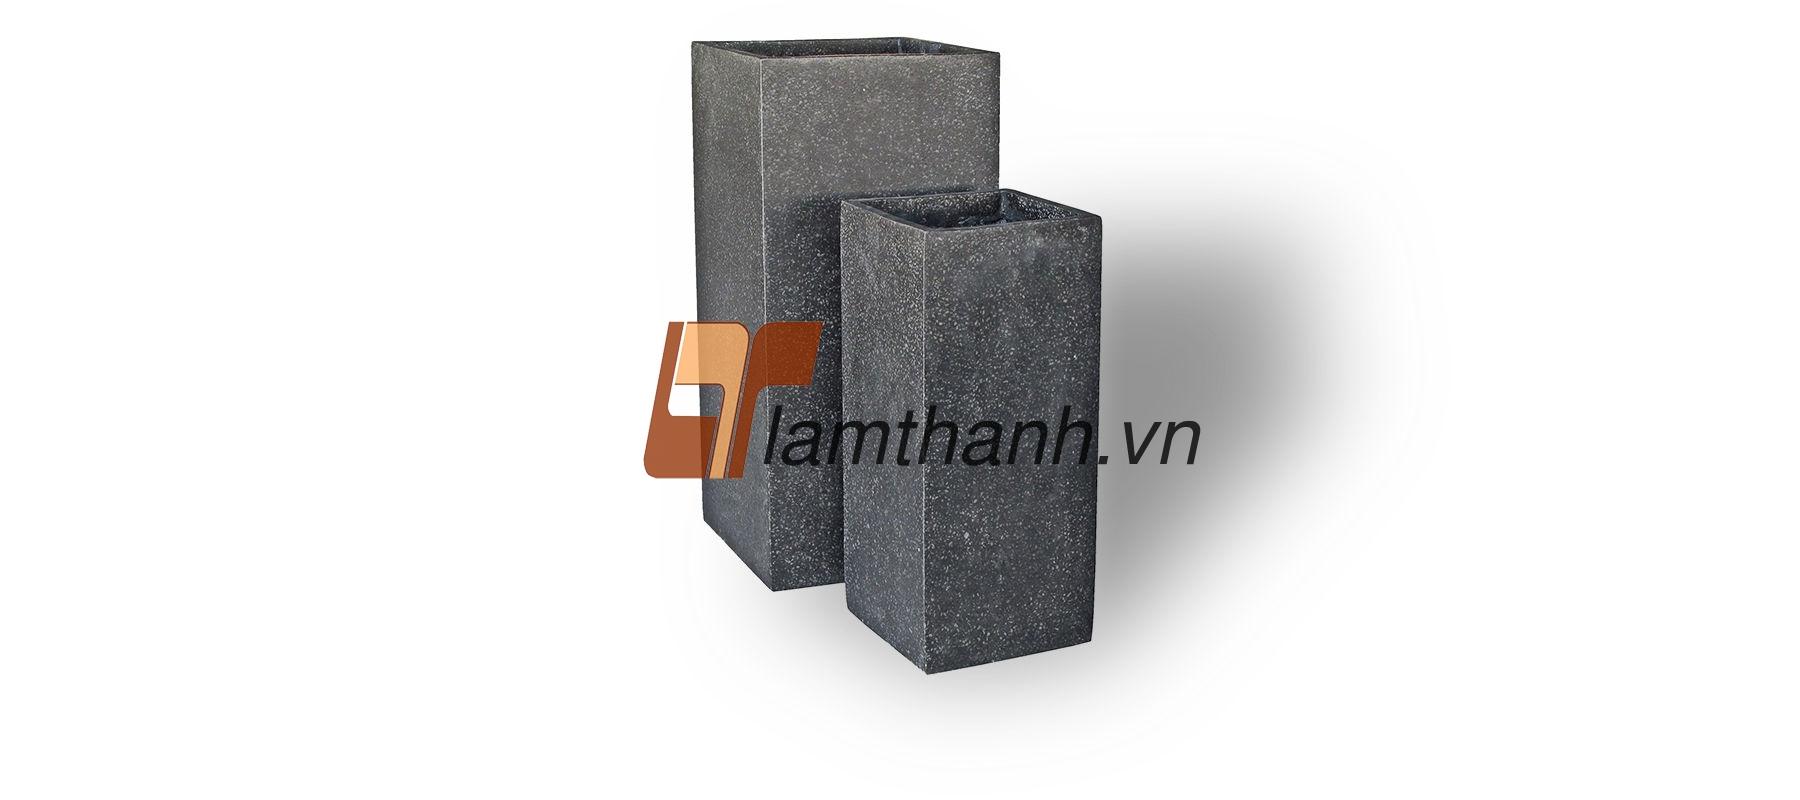 vietnam terrazzo, concrete 02